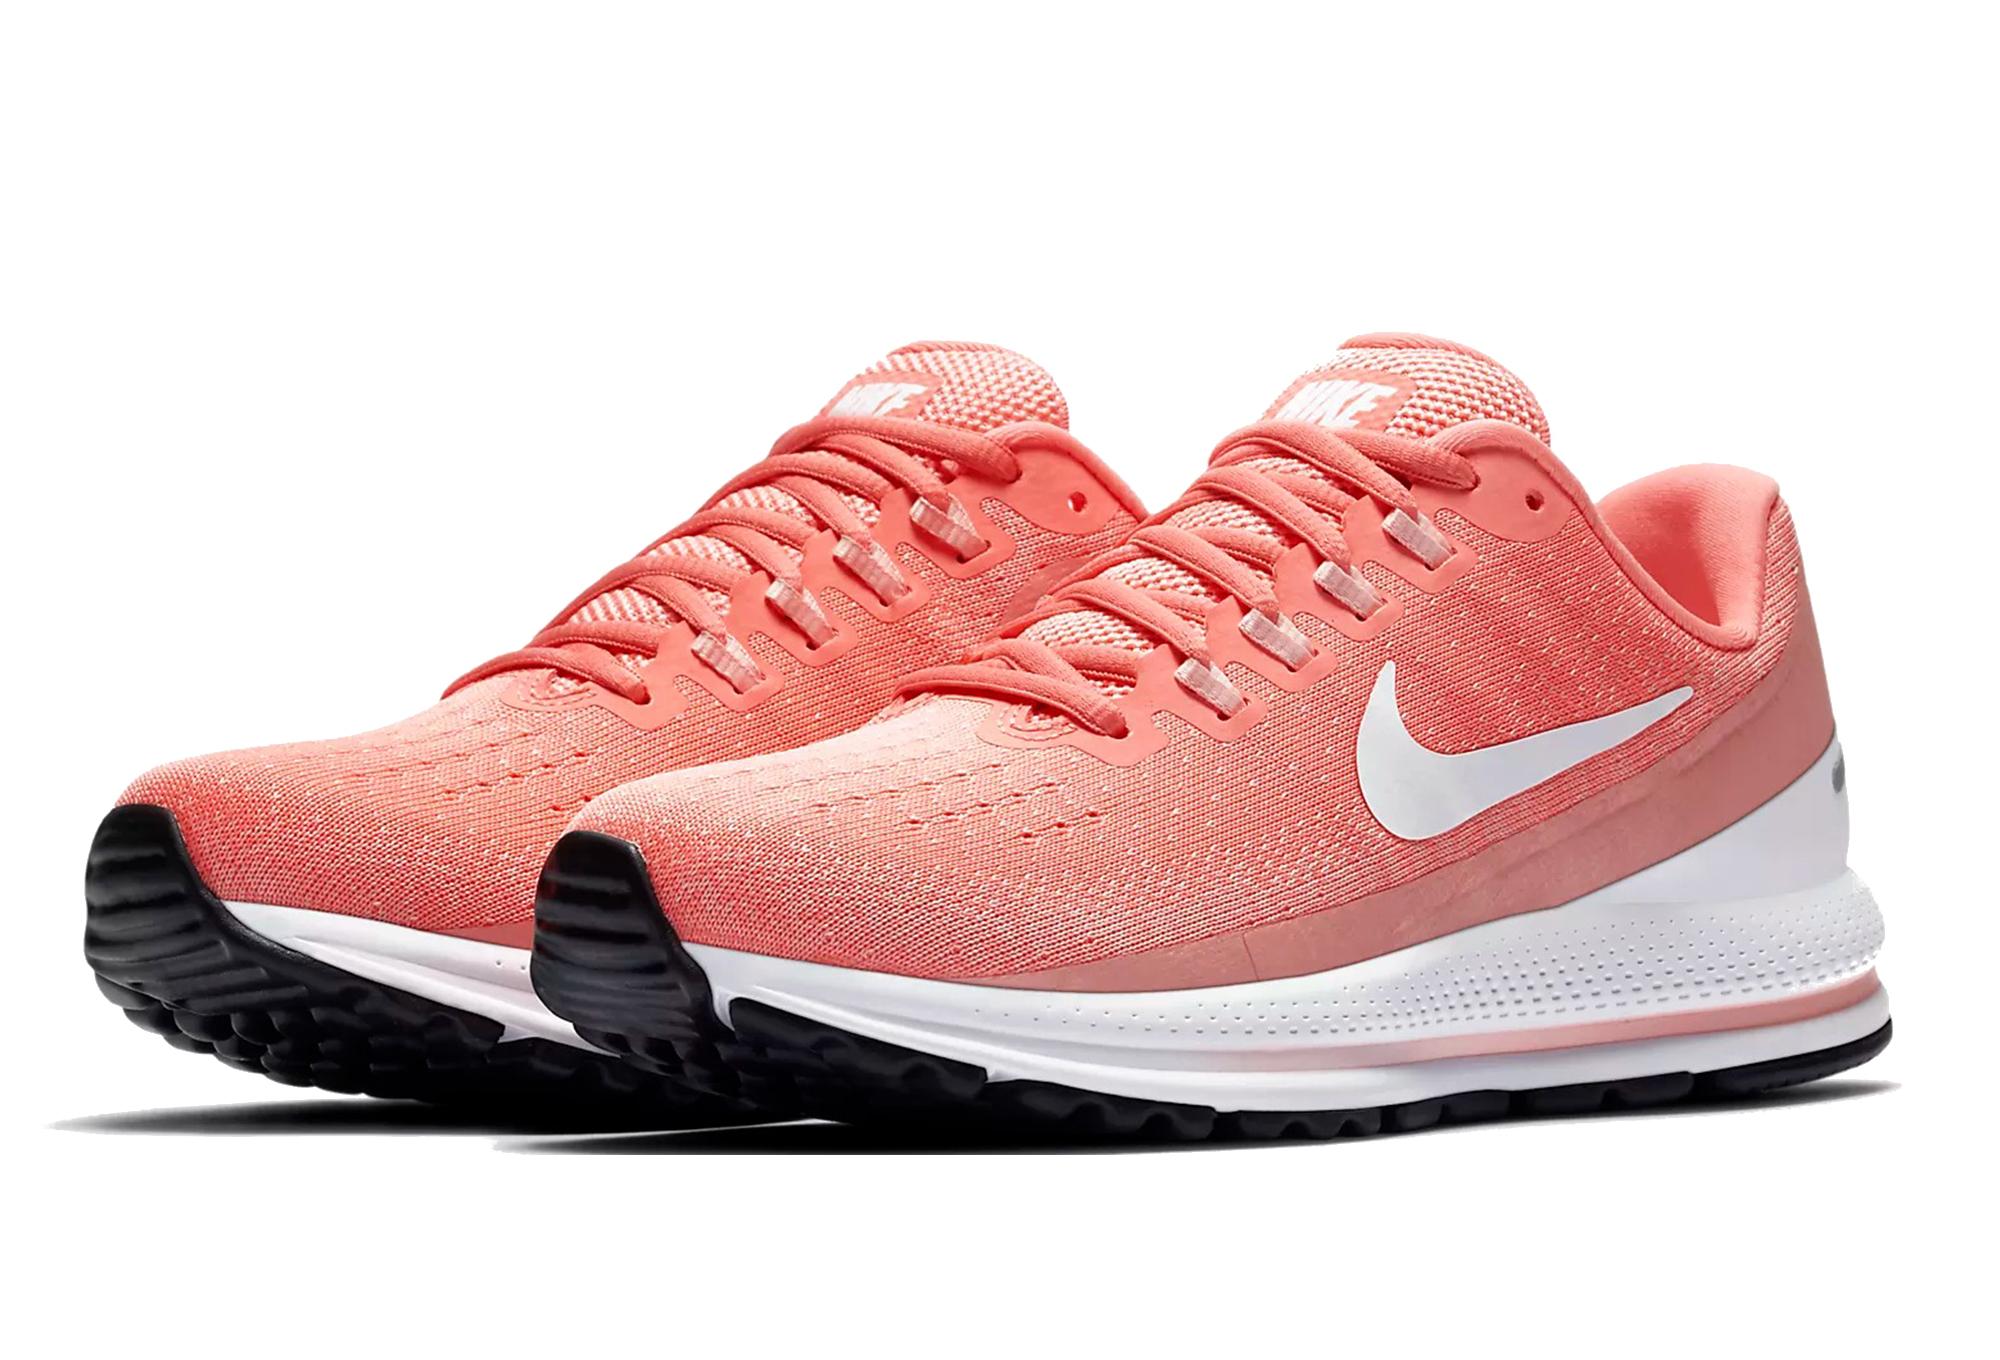 online store 6c77c 3d460 Chaussures de Running Femme Nike Air Zoom Vomero 13 Rose   Blanc